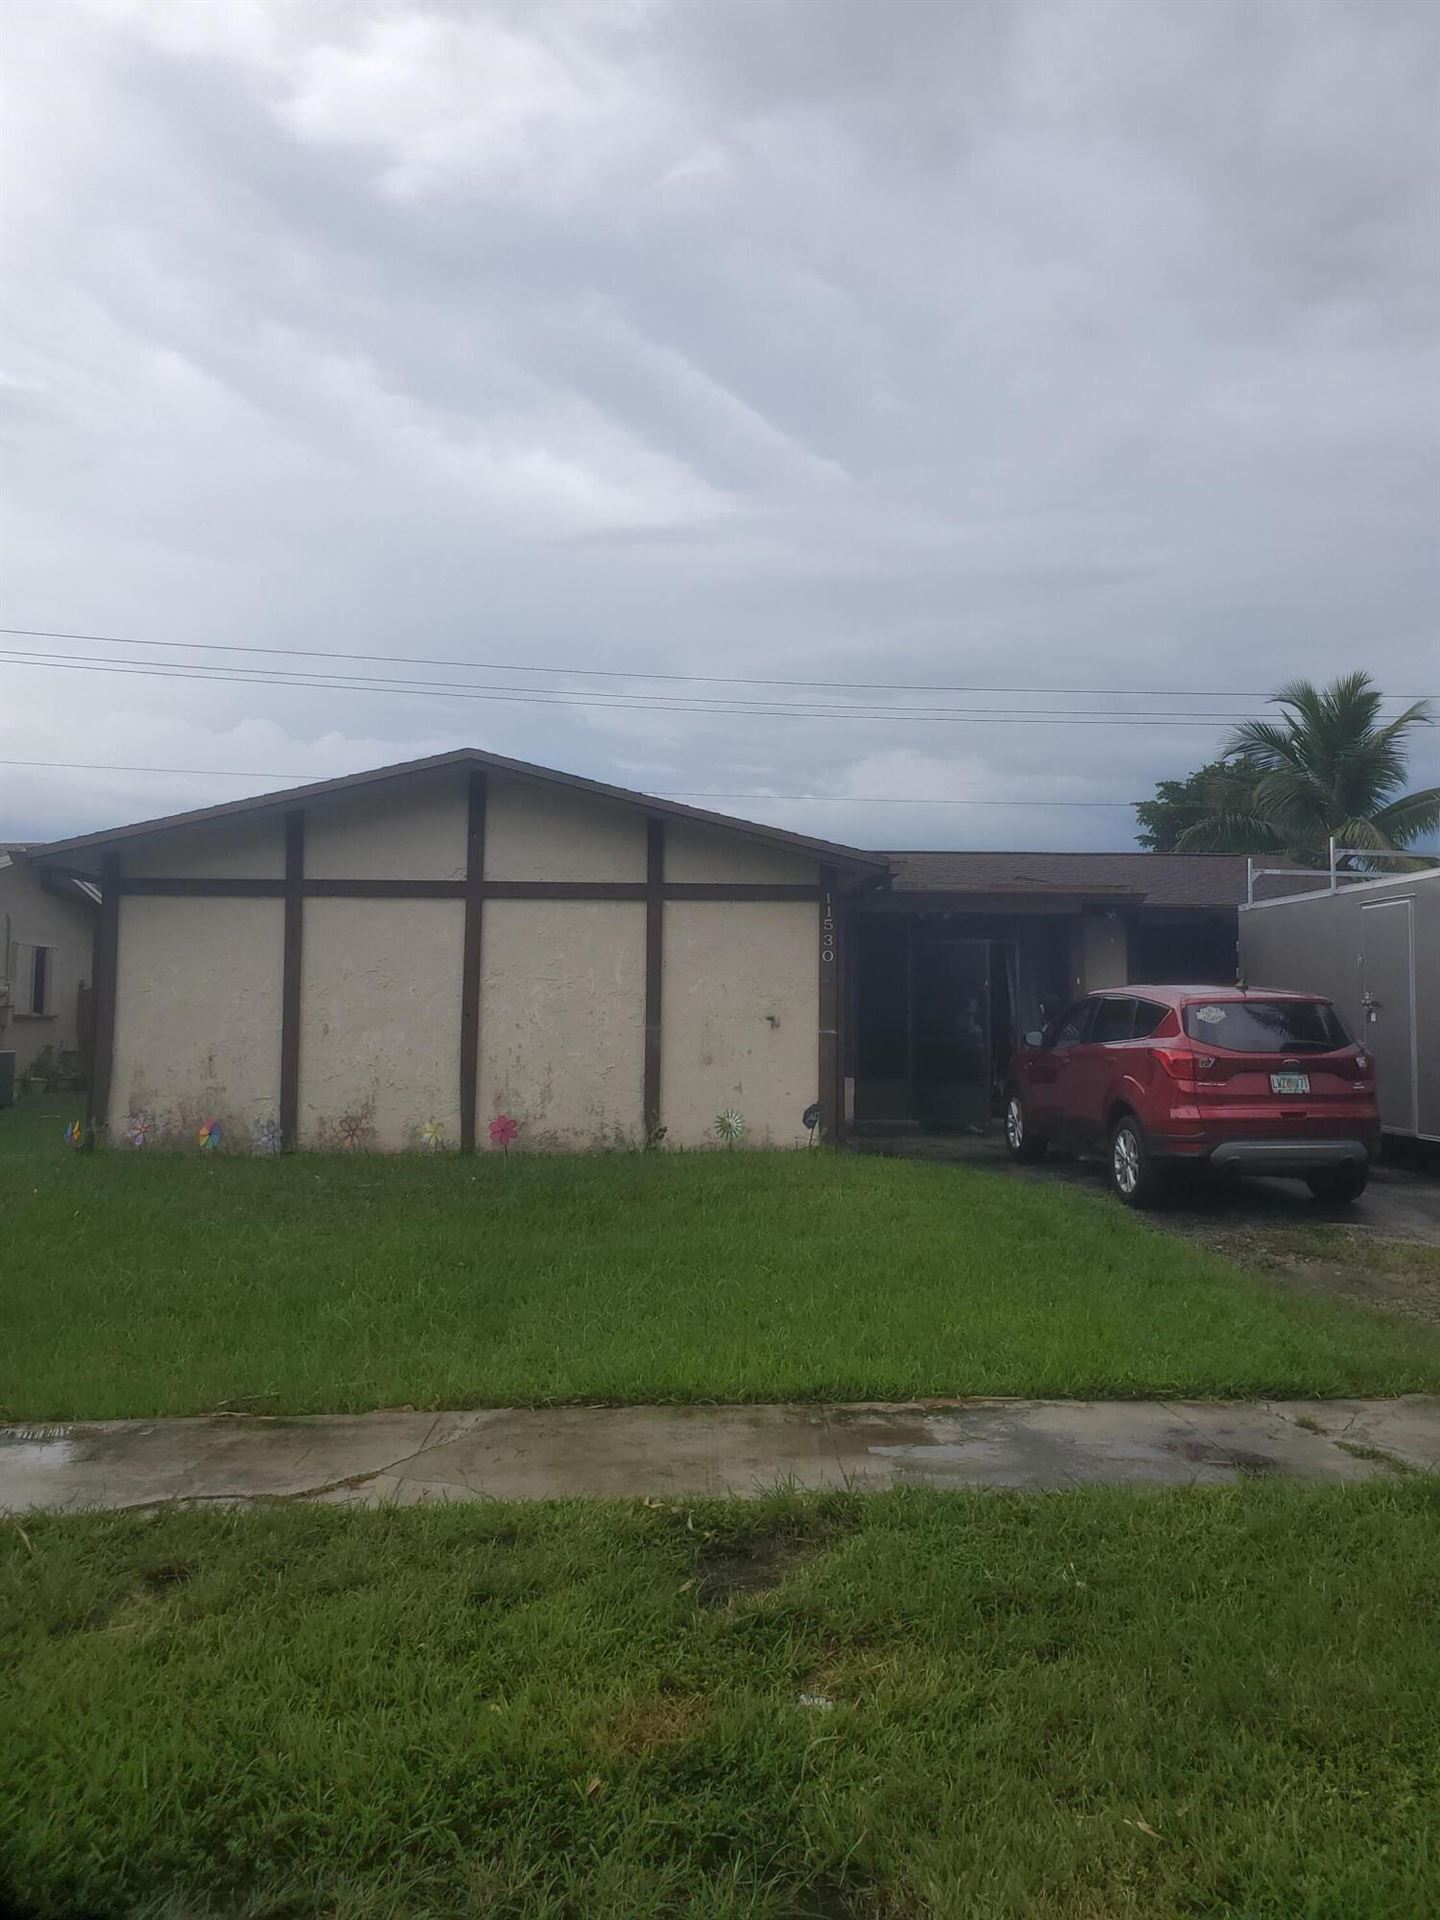 Photo of 11530 NW 35th Street, Sunrise, FL 33323 (MLS # RX-10753109)